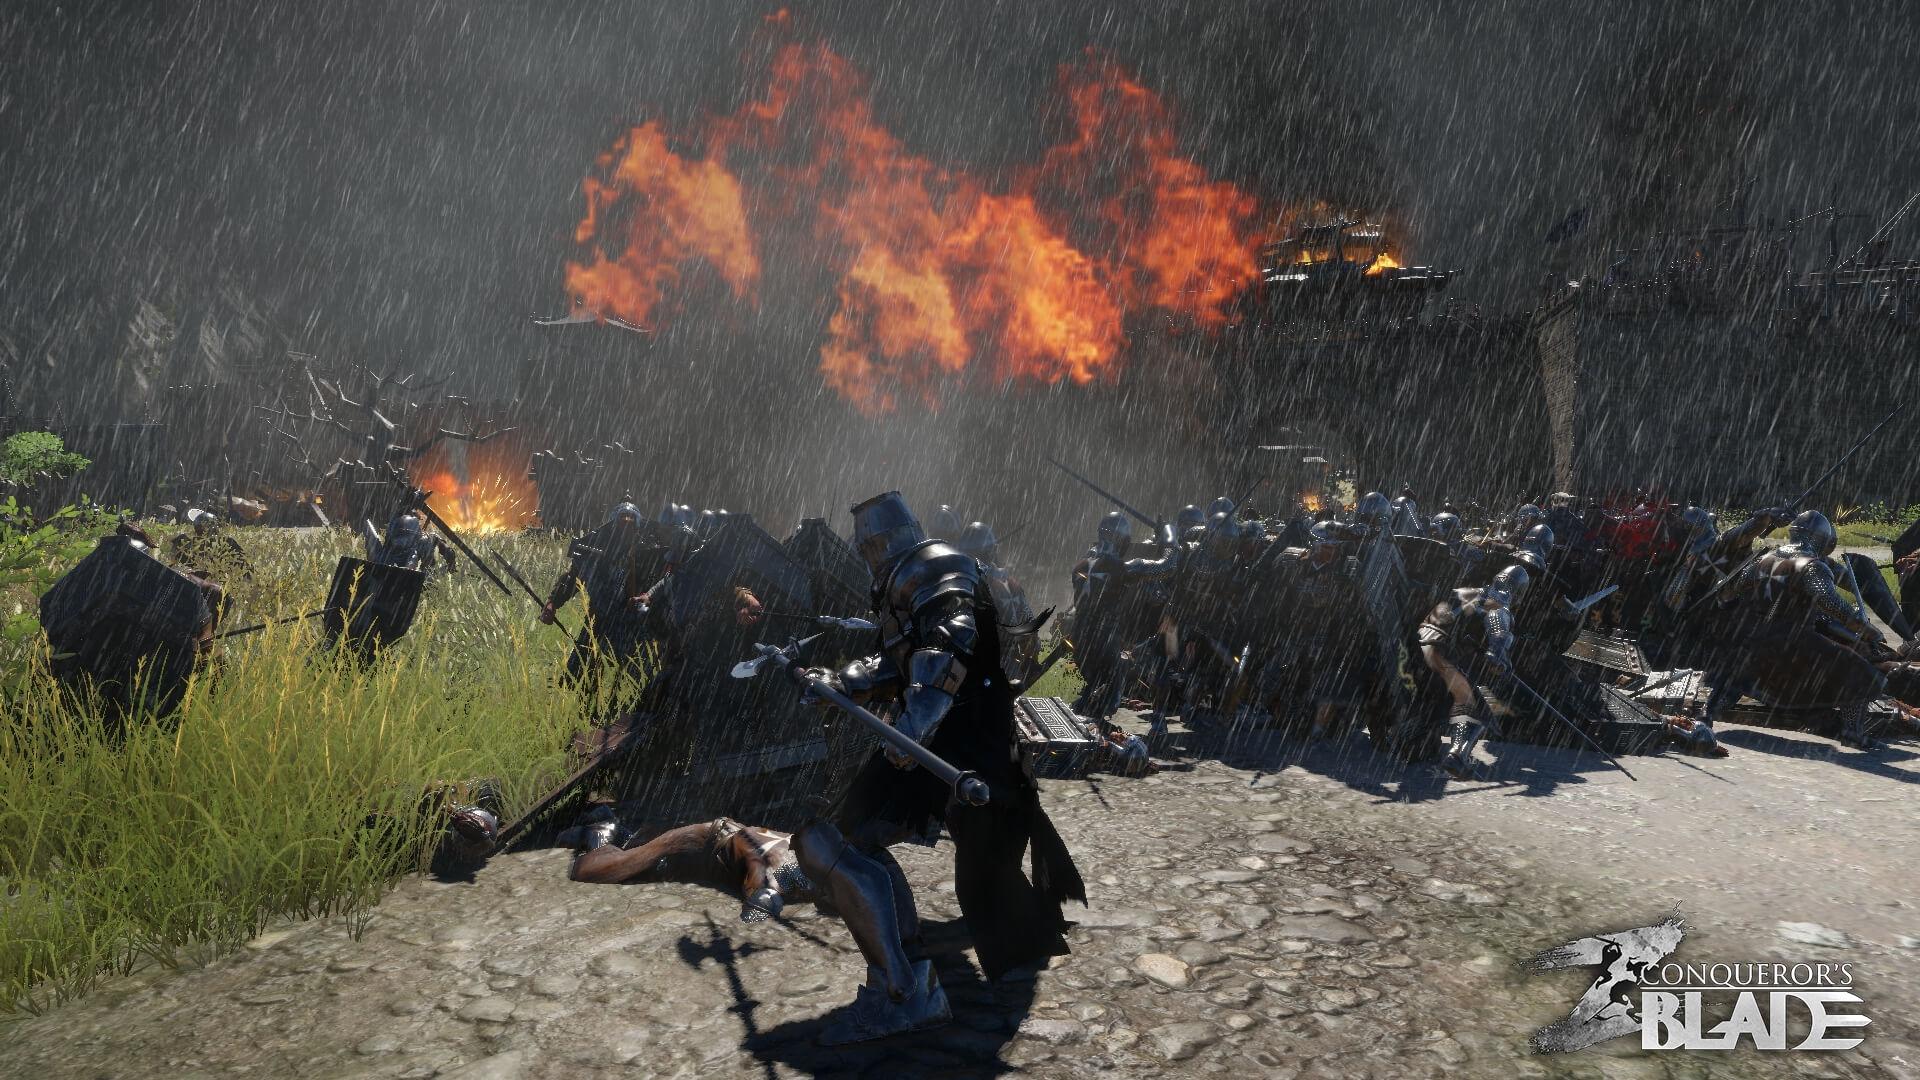 Conqueror's Blade Screenshot 1